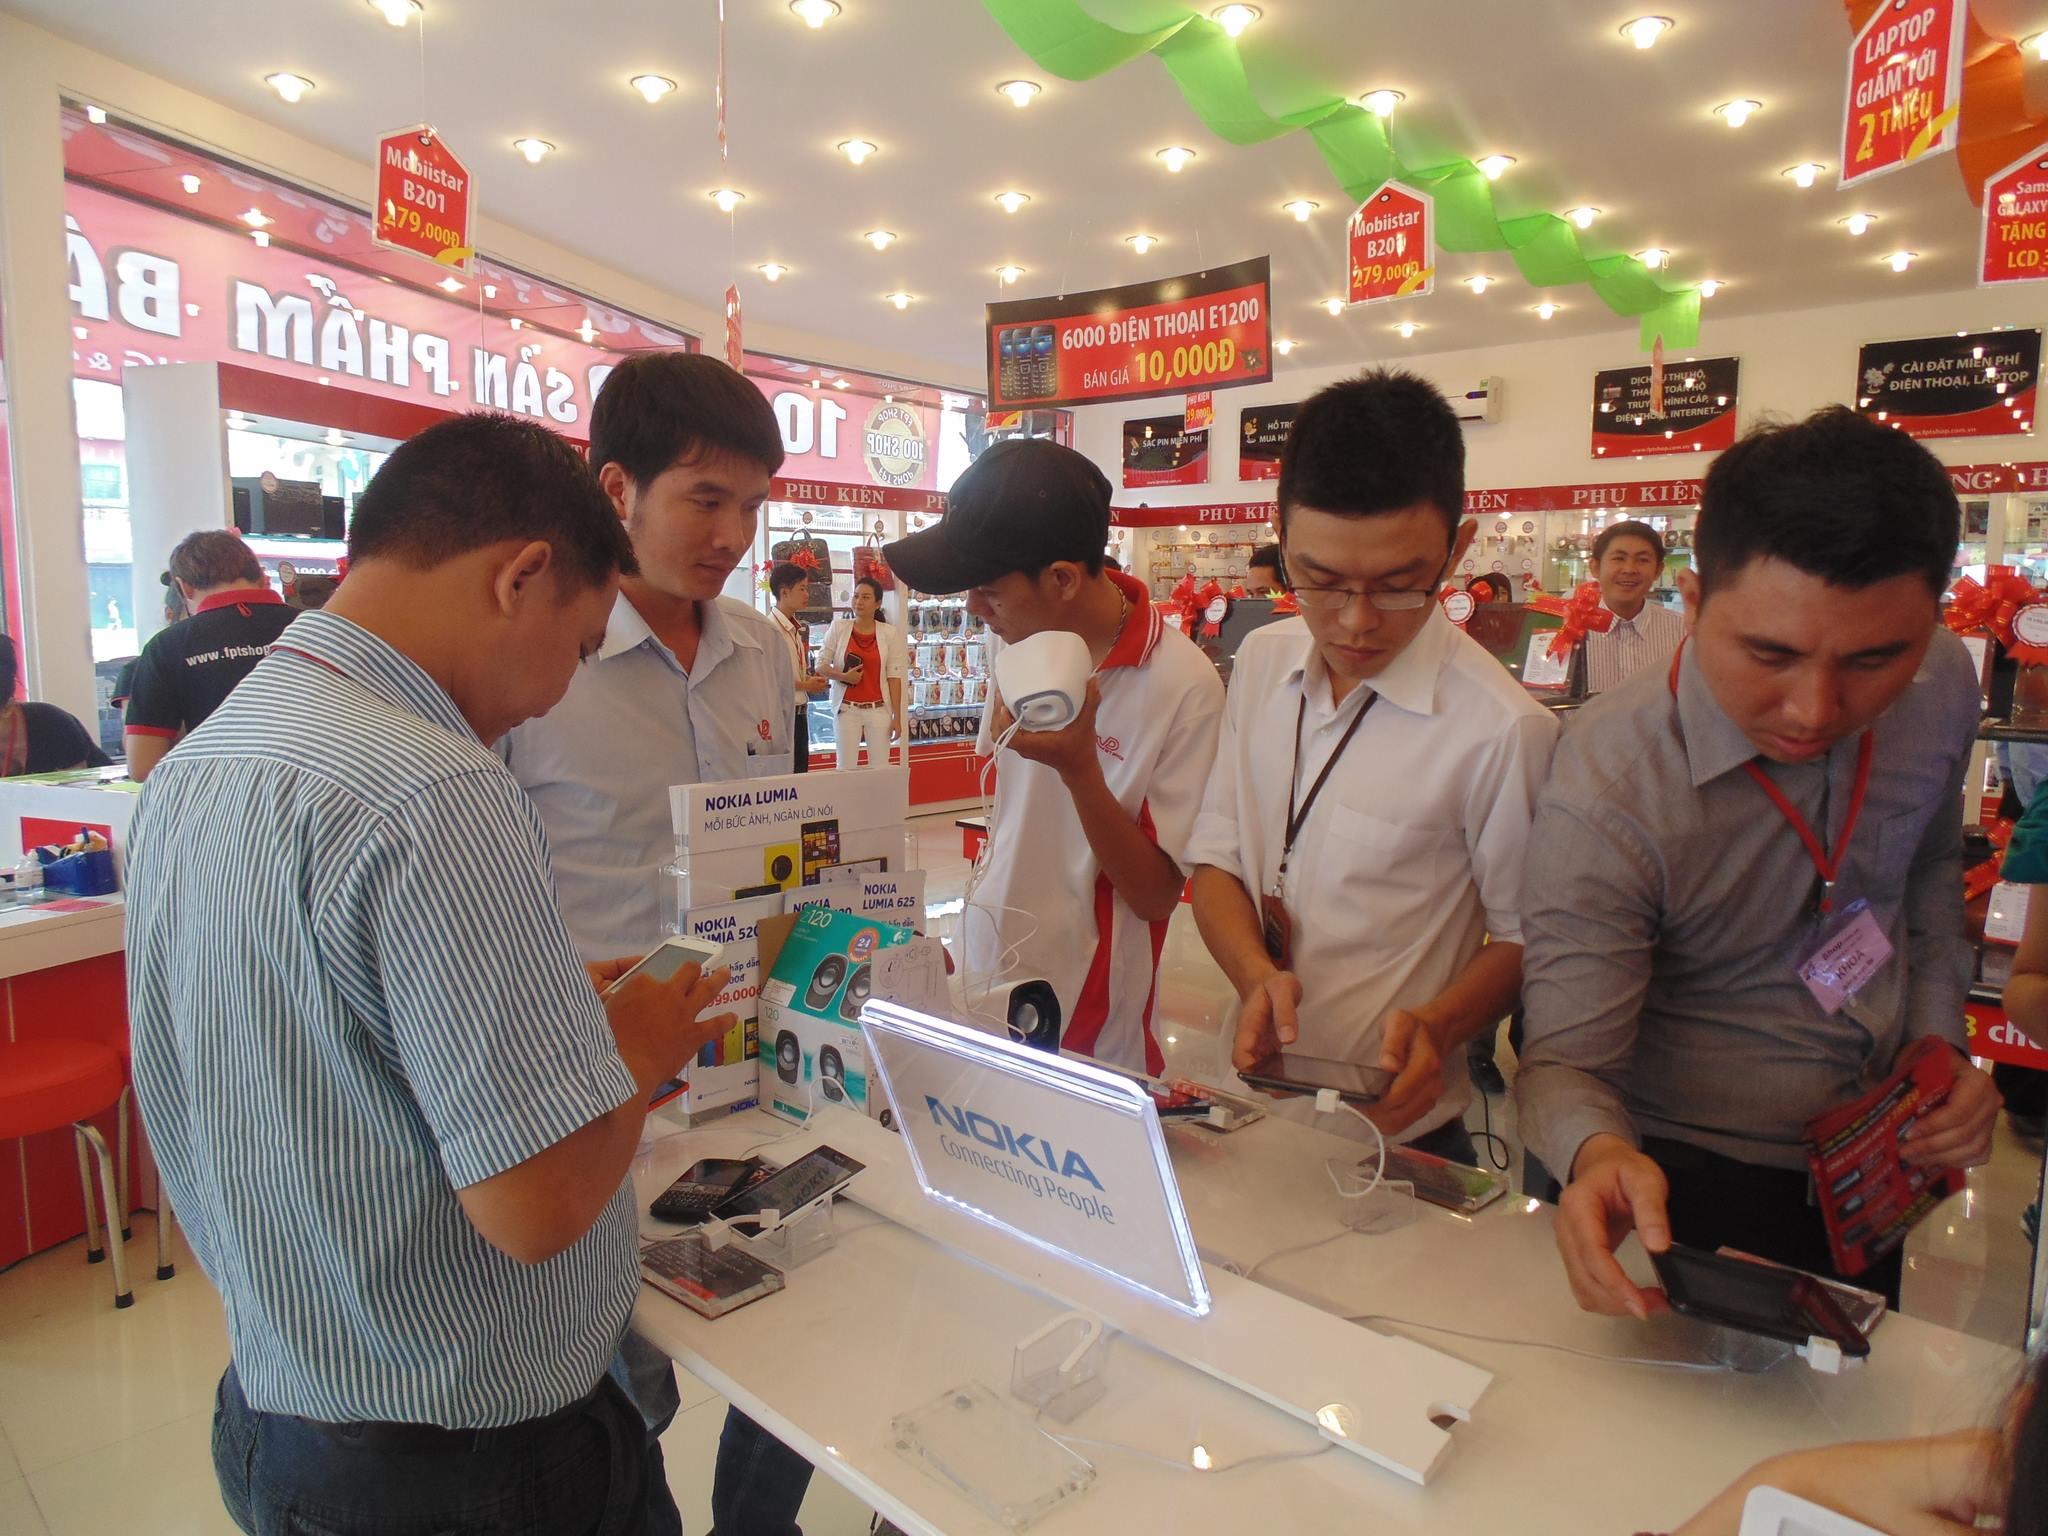 FPT shop - FPT Shop: Đổi smartphone lấy Galaxy Note 4